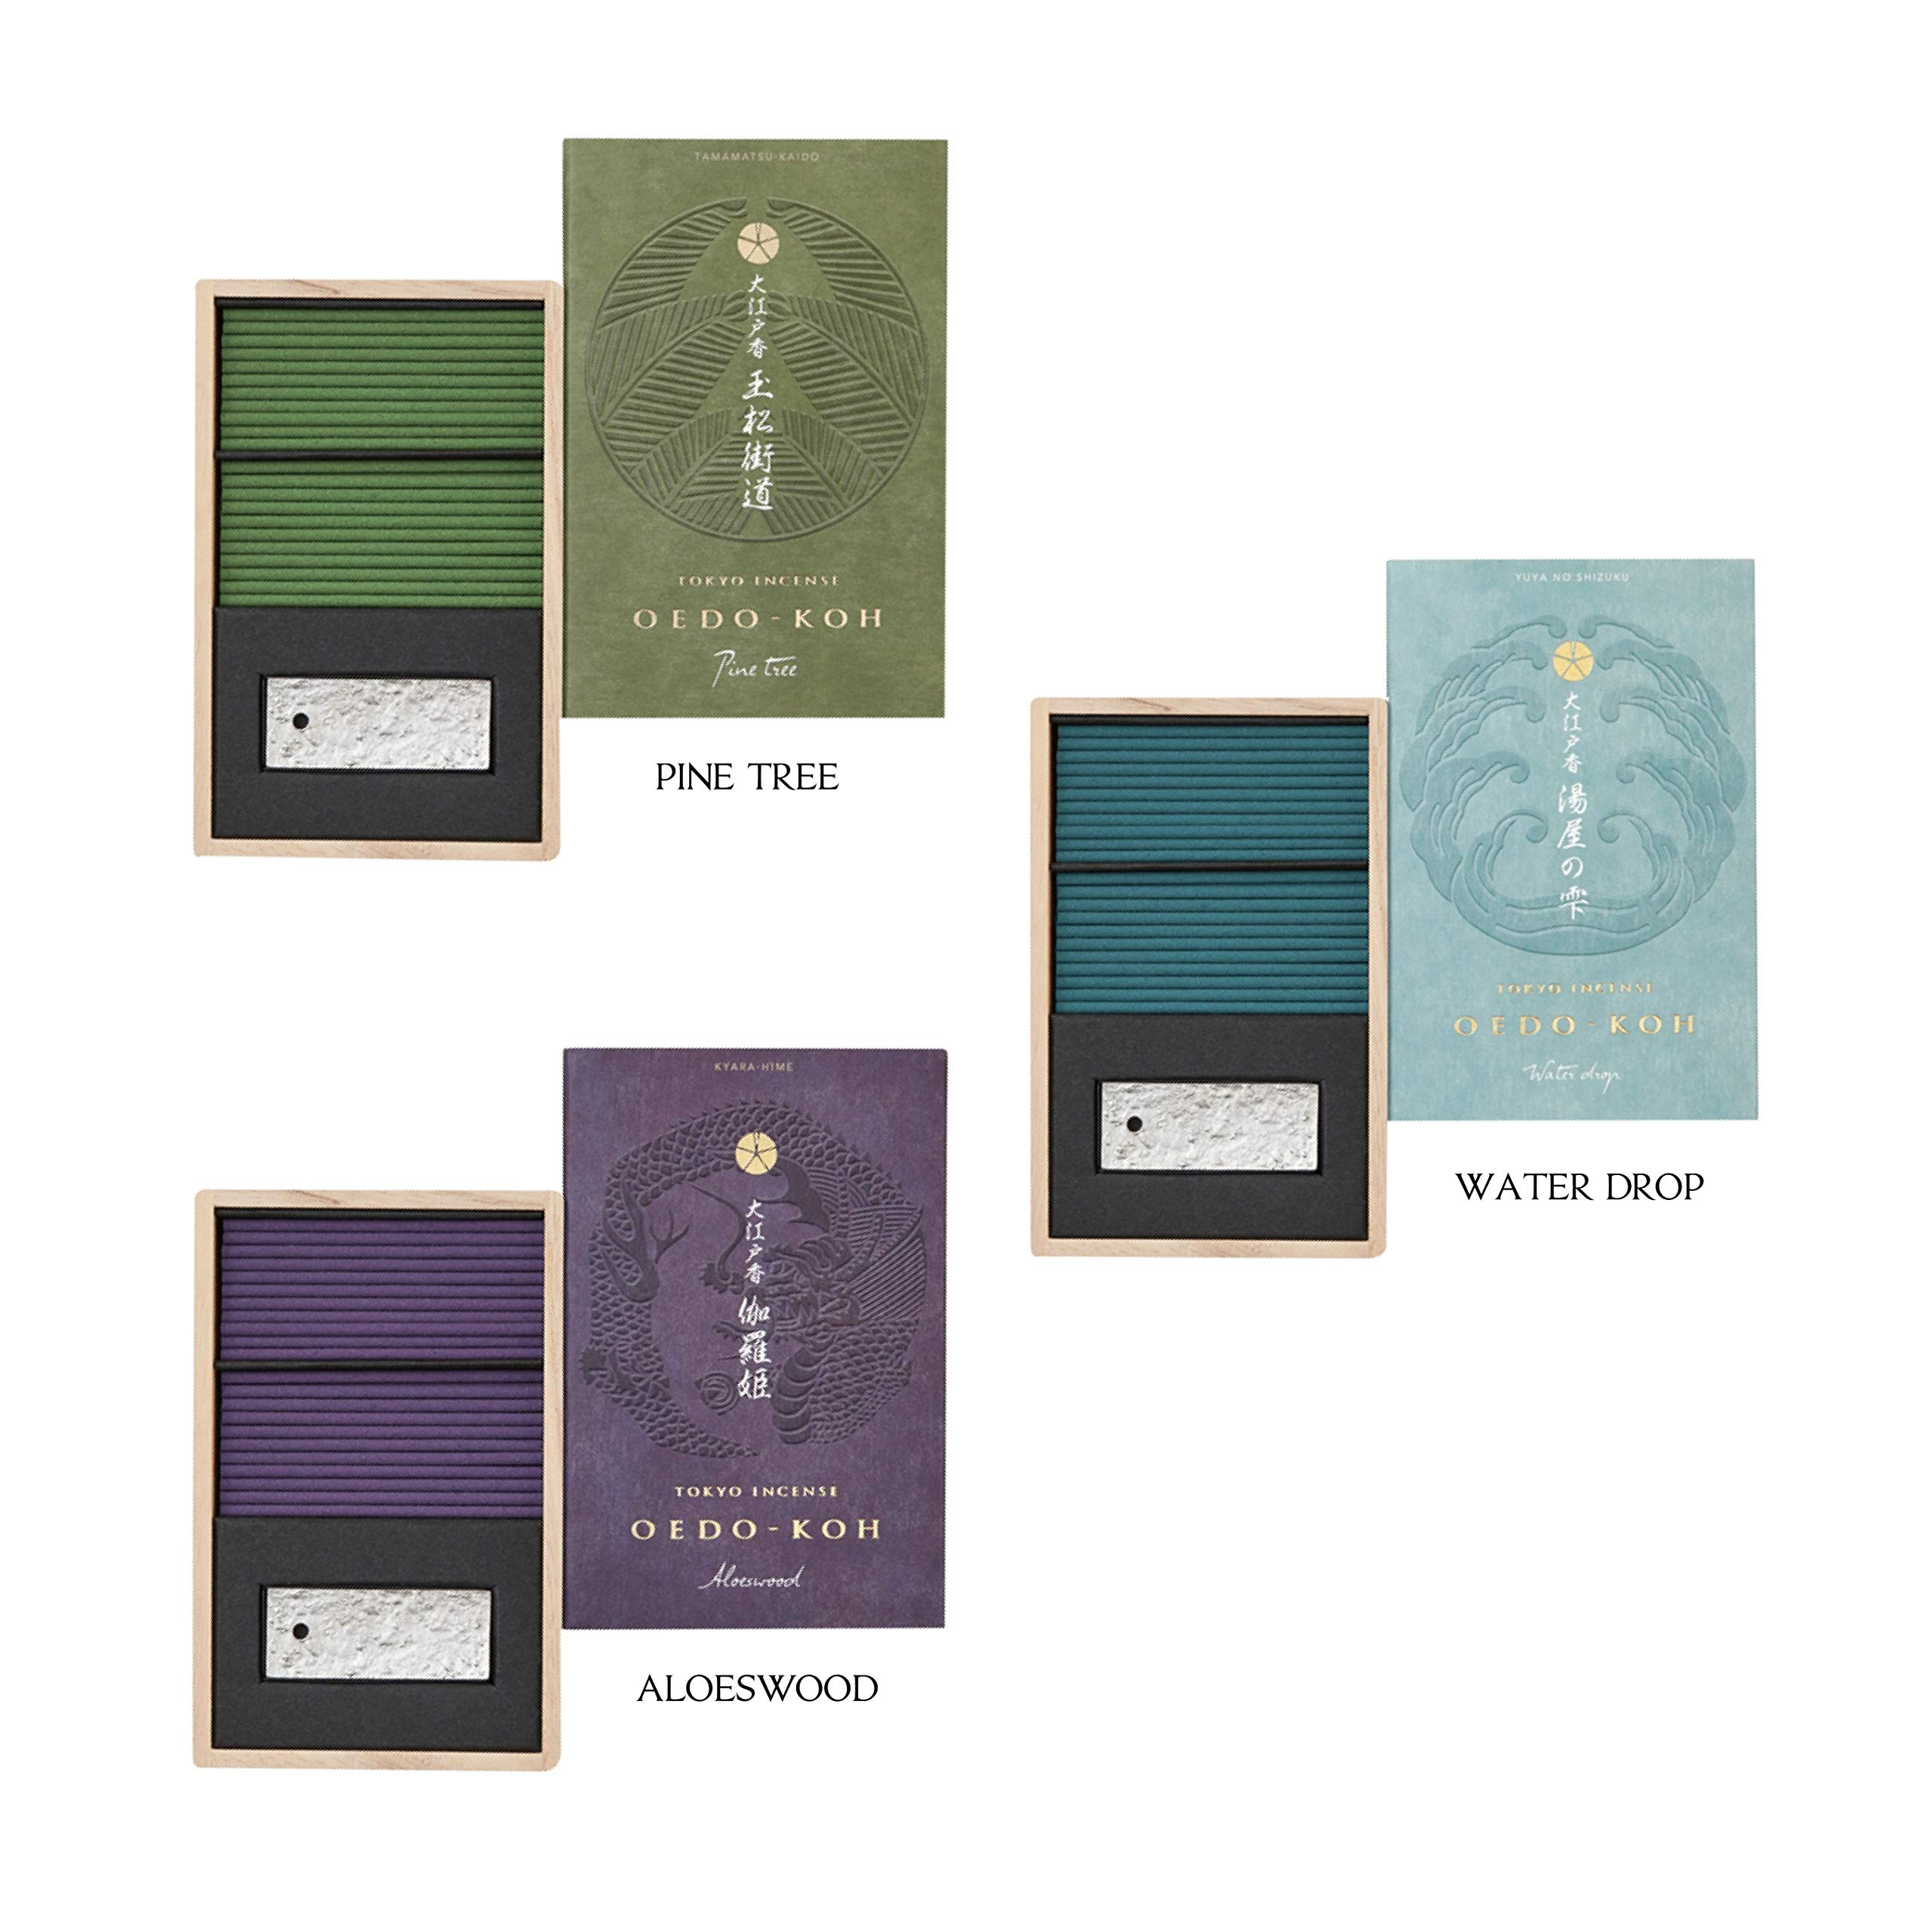 Nippon Kodo OEDO-KOH - Life in Edo Japan Luxury Collection (Water Drop, Pine Tree, Aloeswood) by iTakara (Image #1)